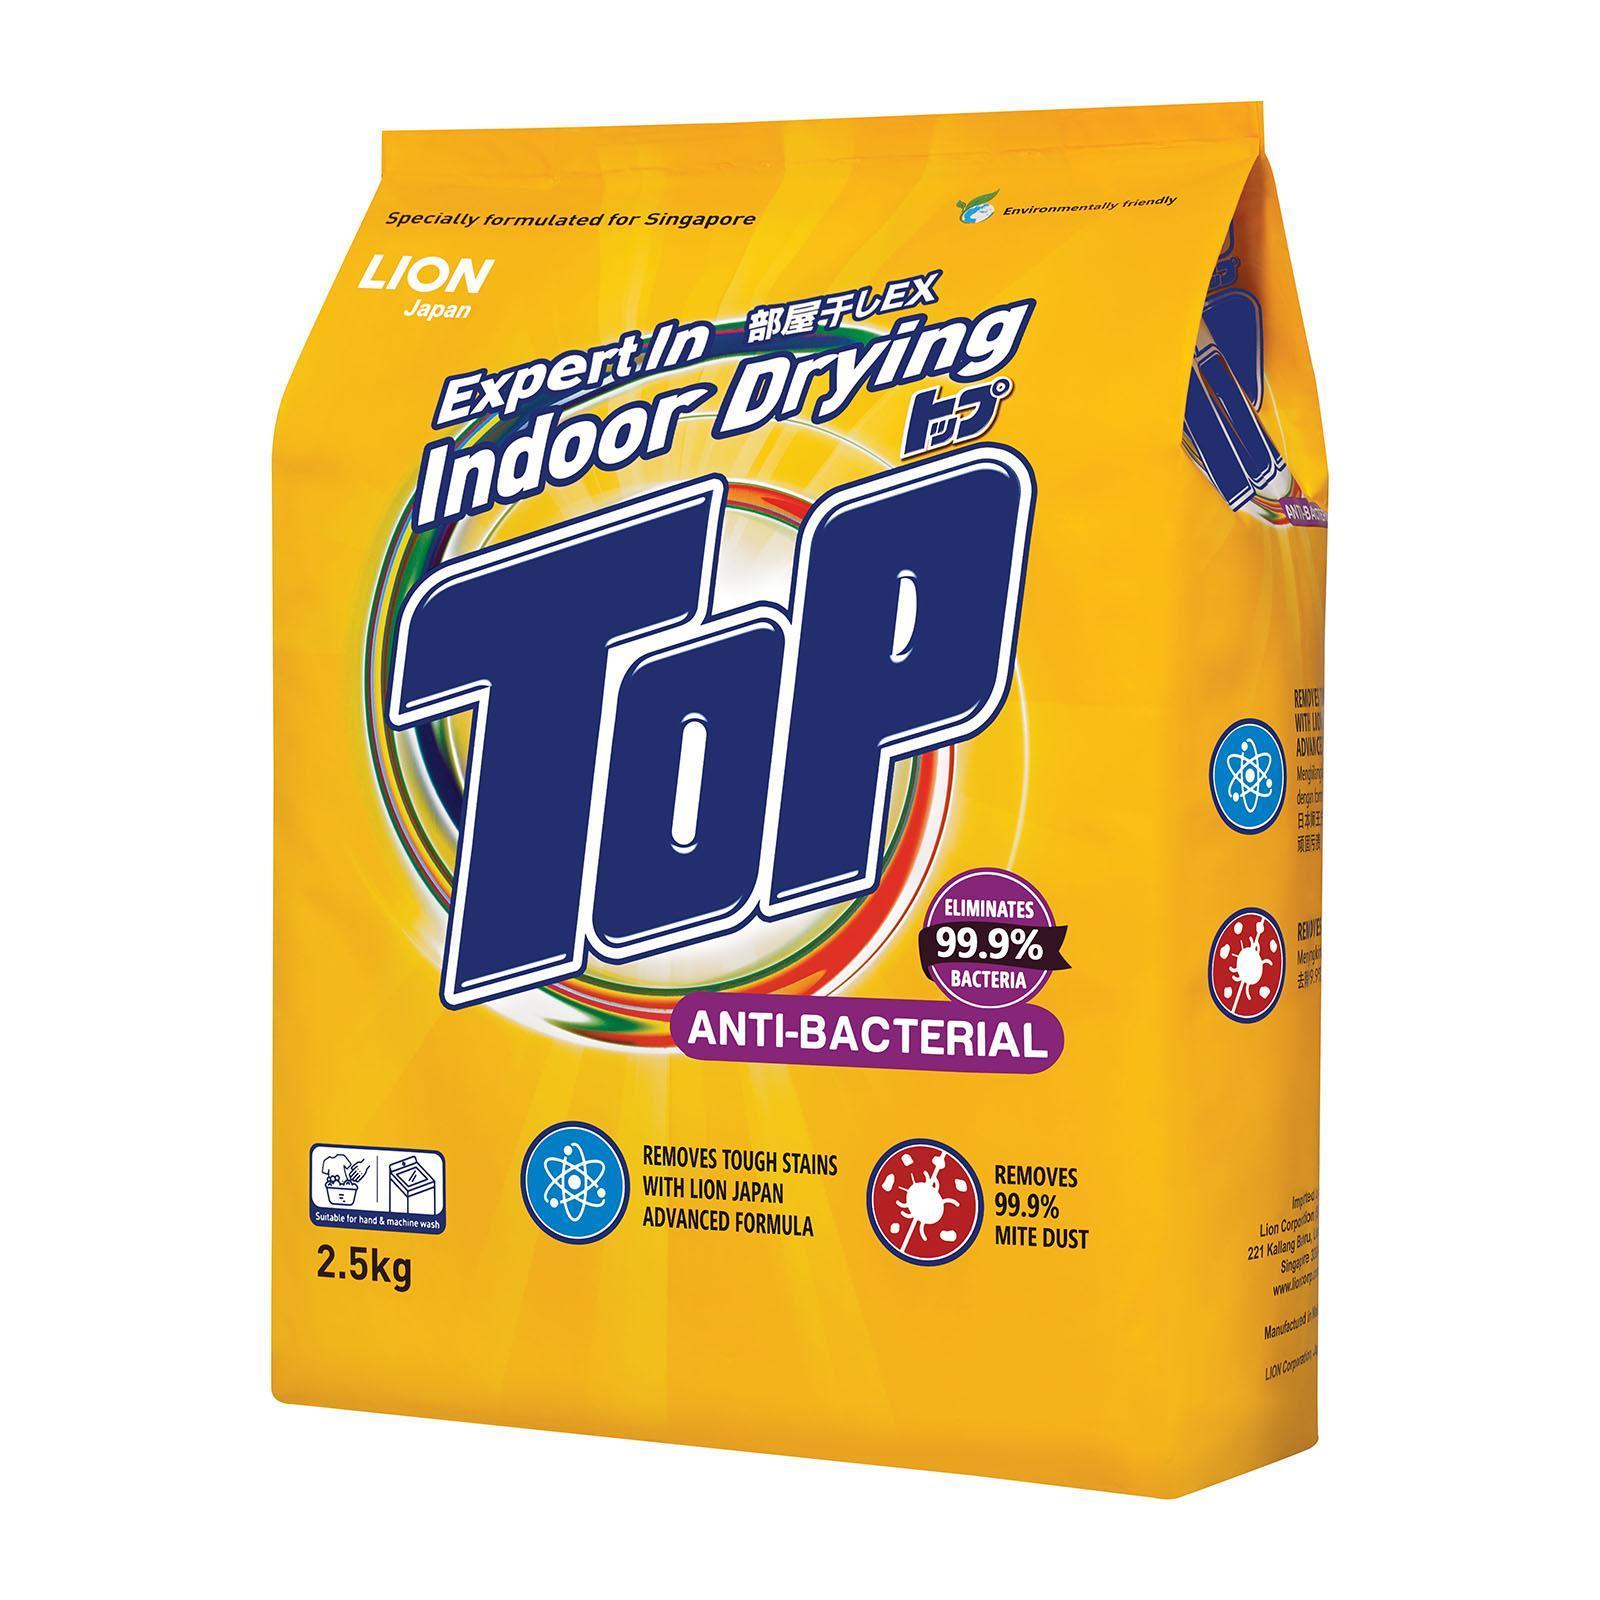 TOP Powder Detergent - Anti-Bacterial 2.5kg